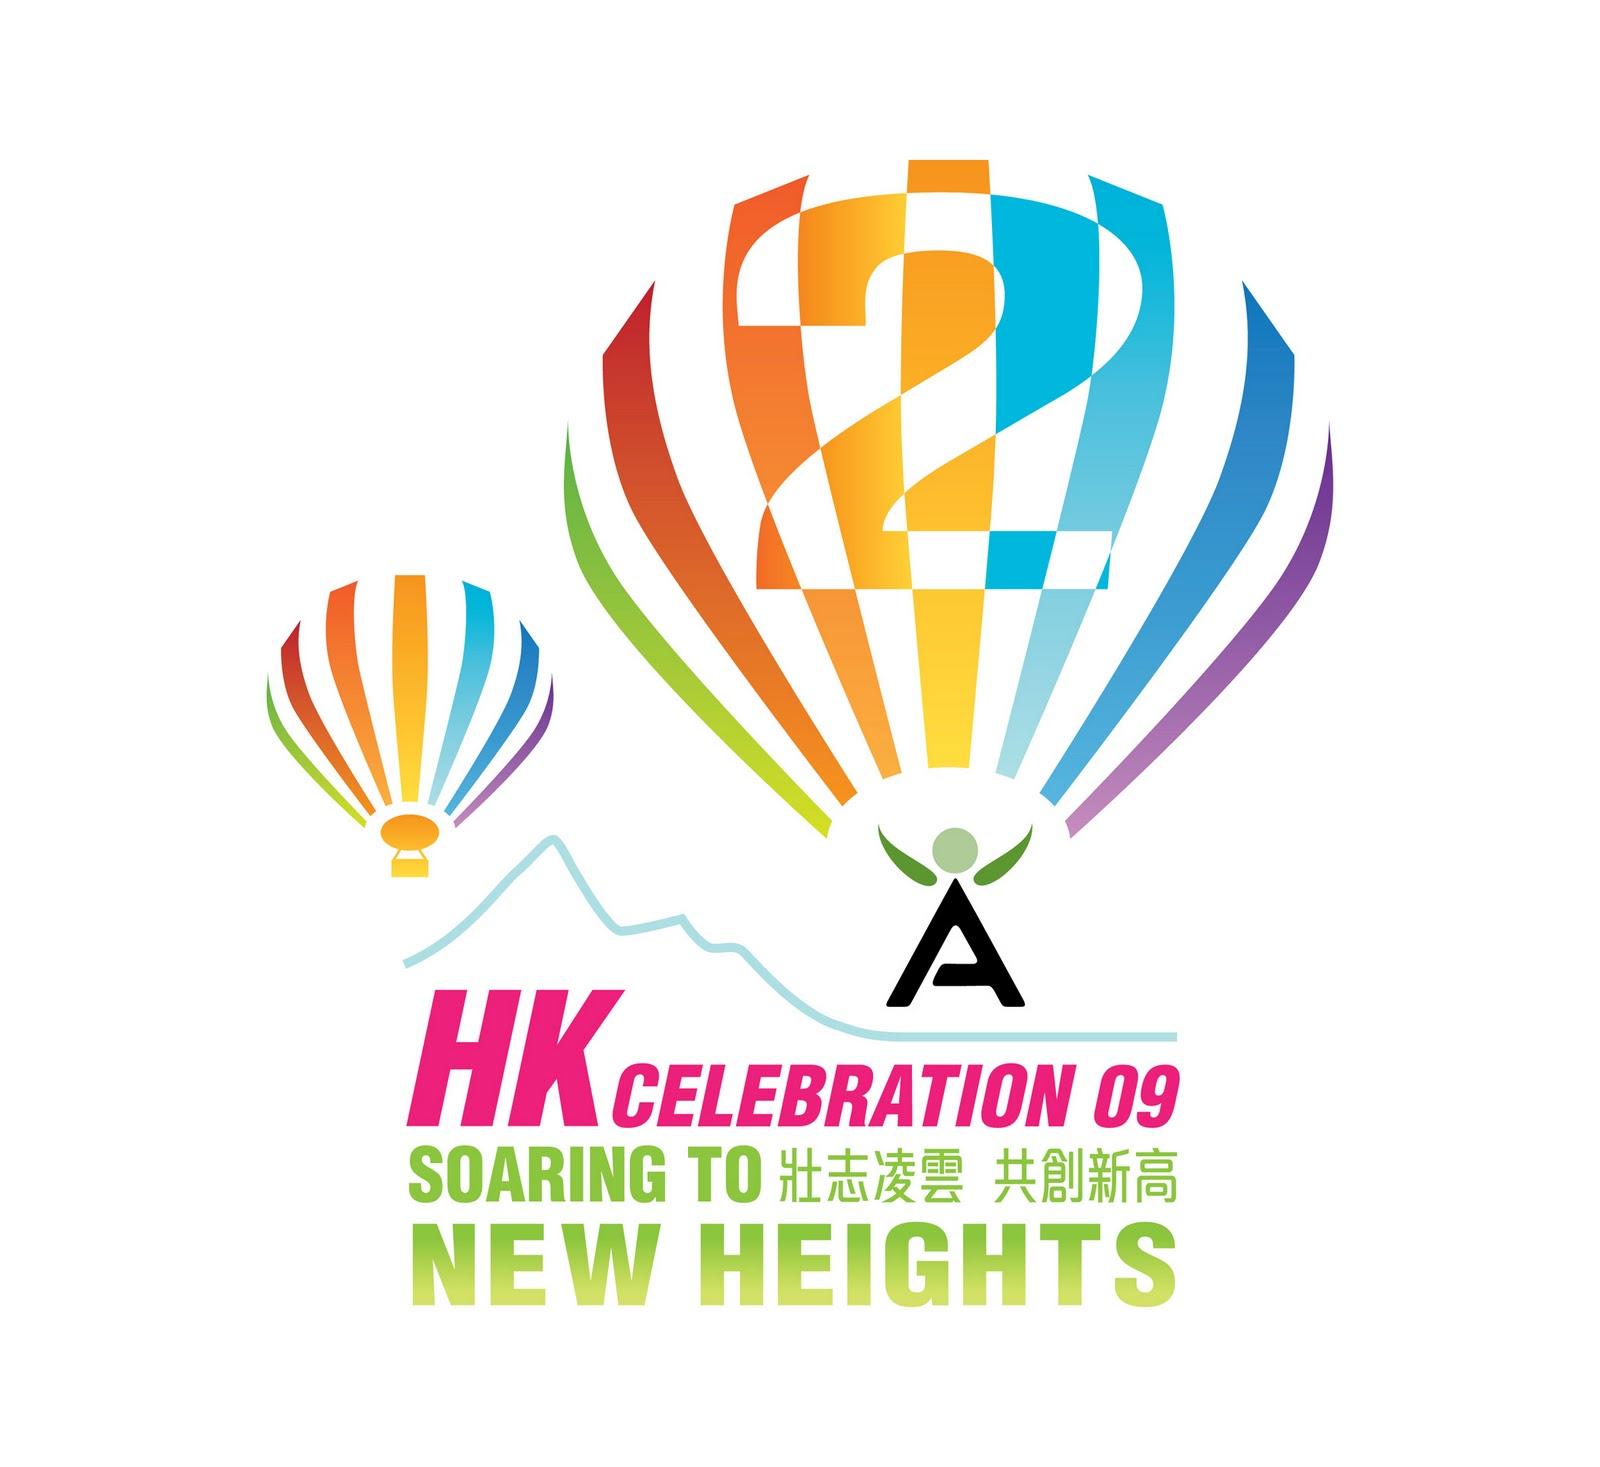 999.9: logo Design - Isagenix Event Logos